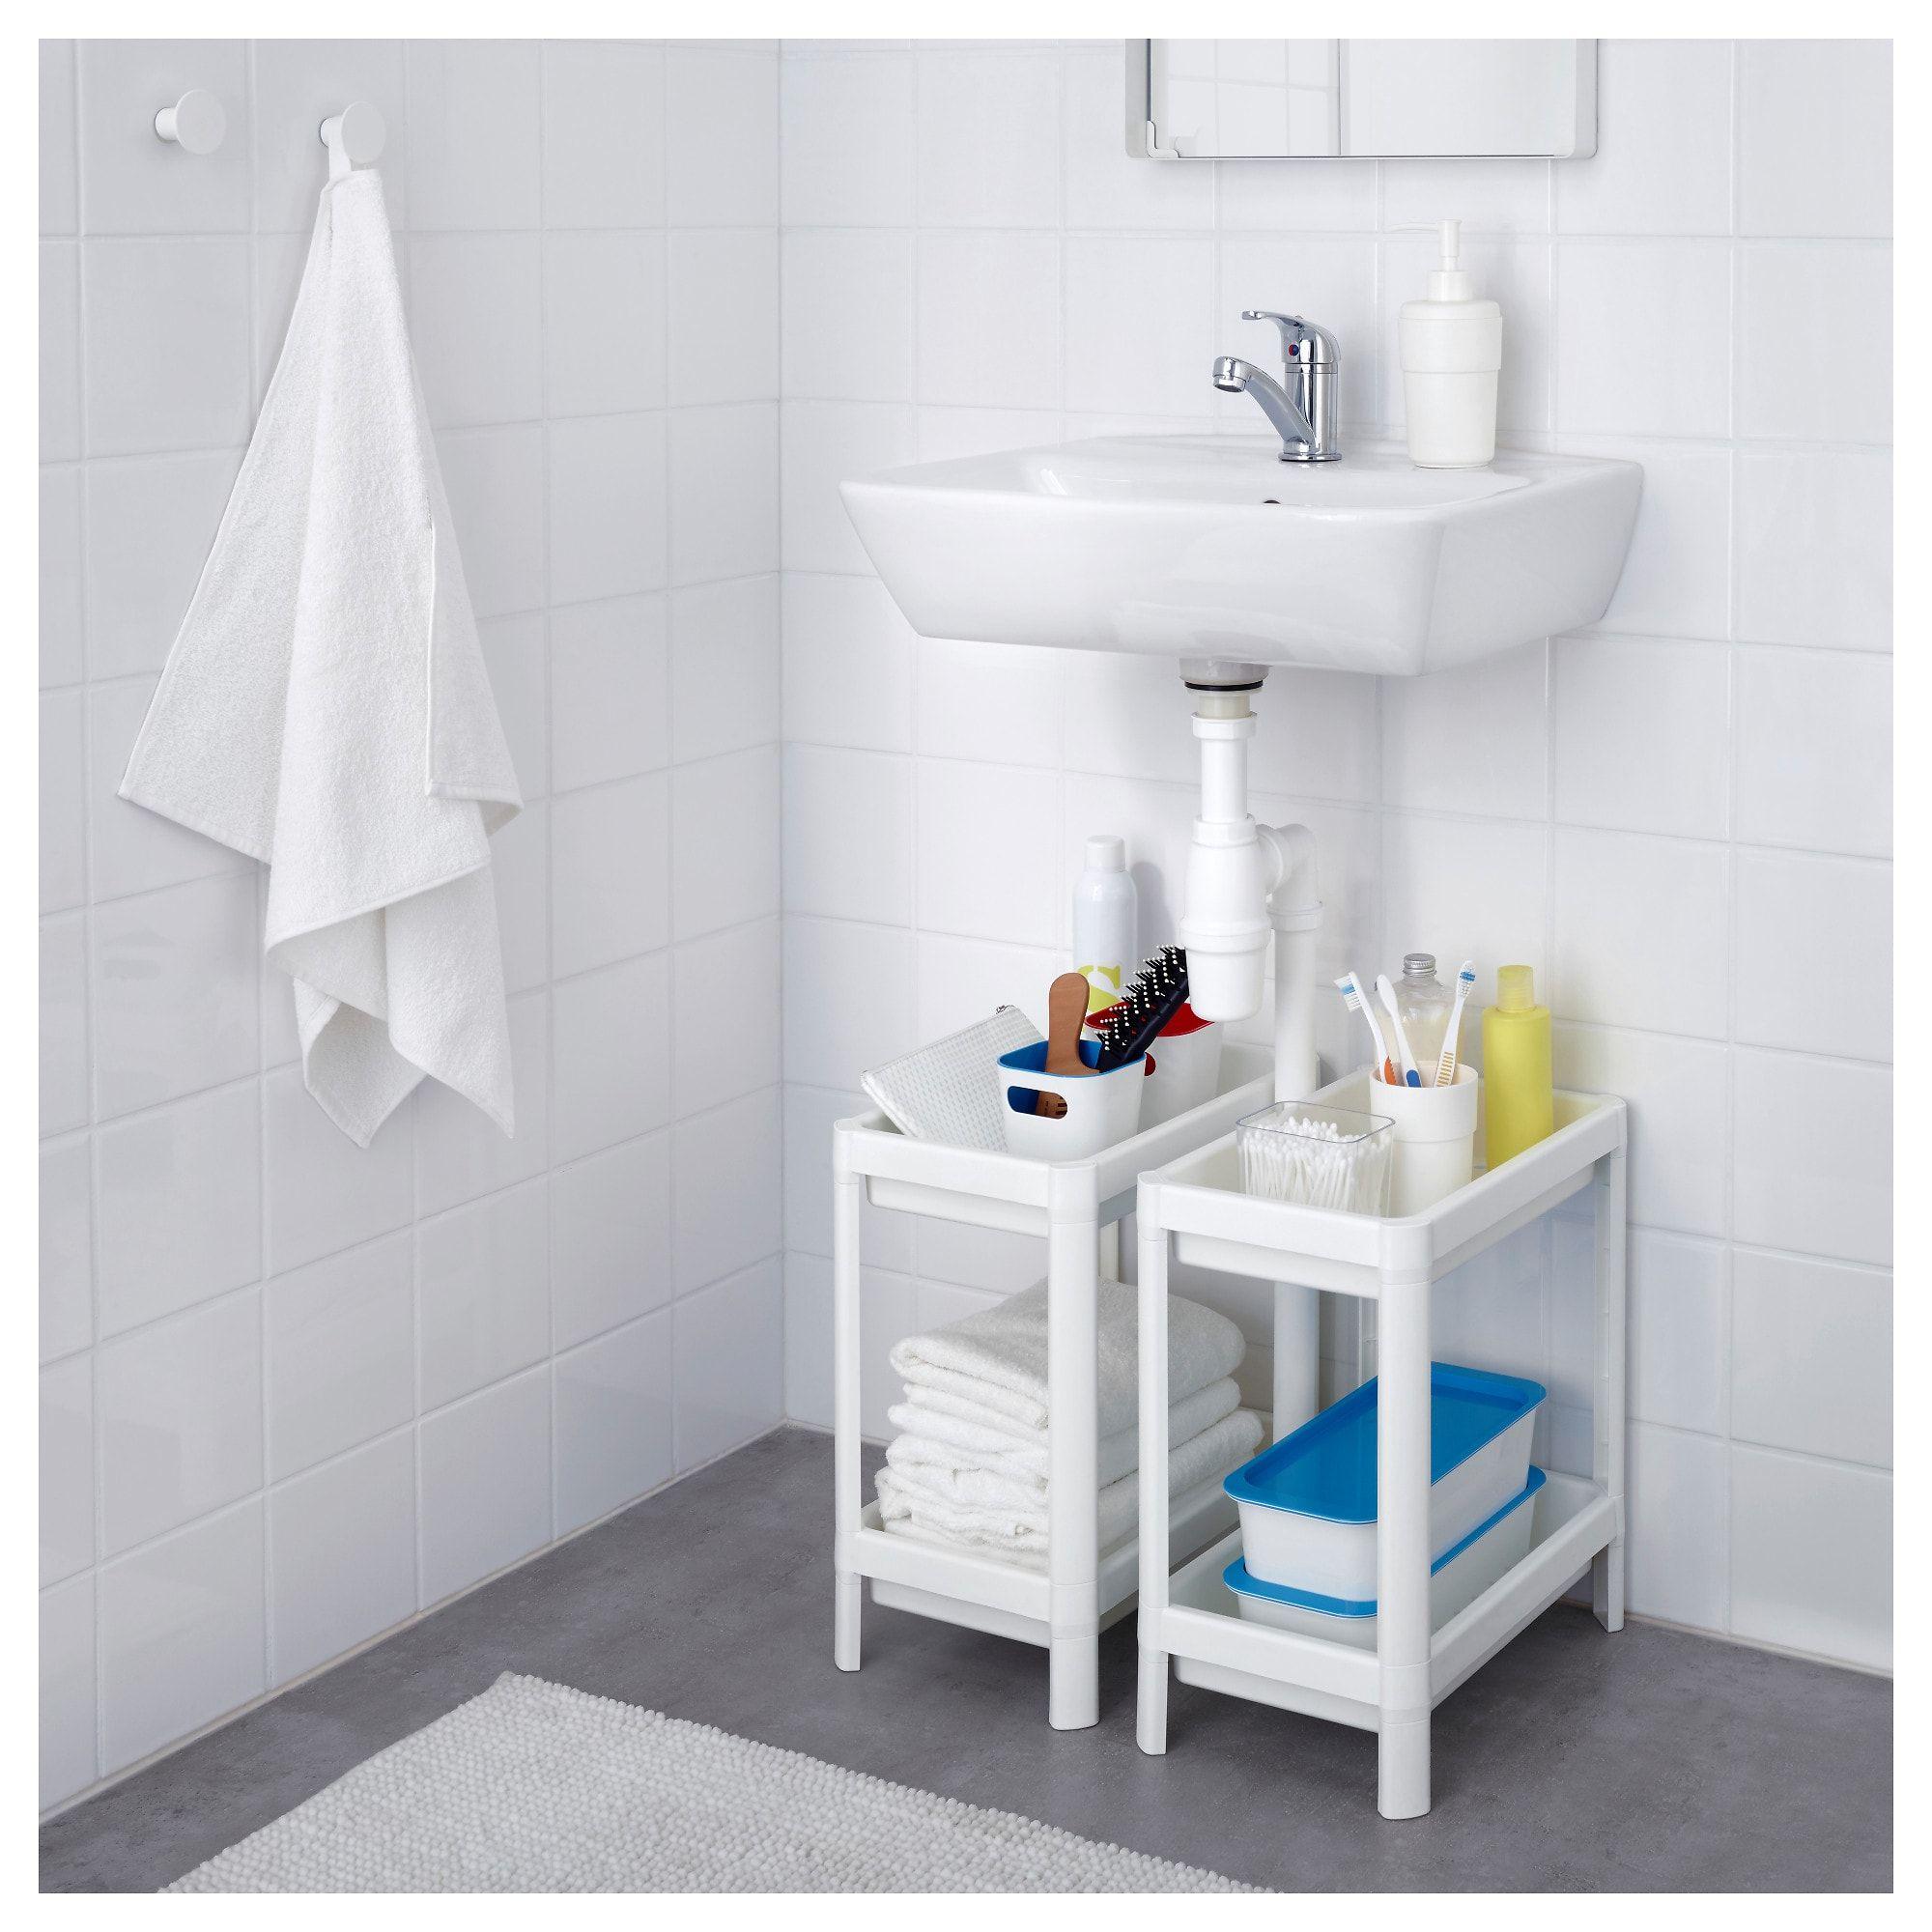 VESKEN white, Shelf unit, 36x23x40 cm IKEA Under